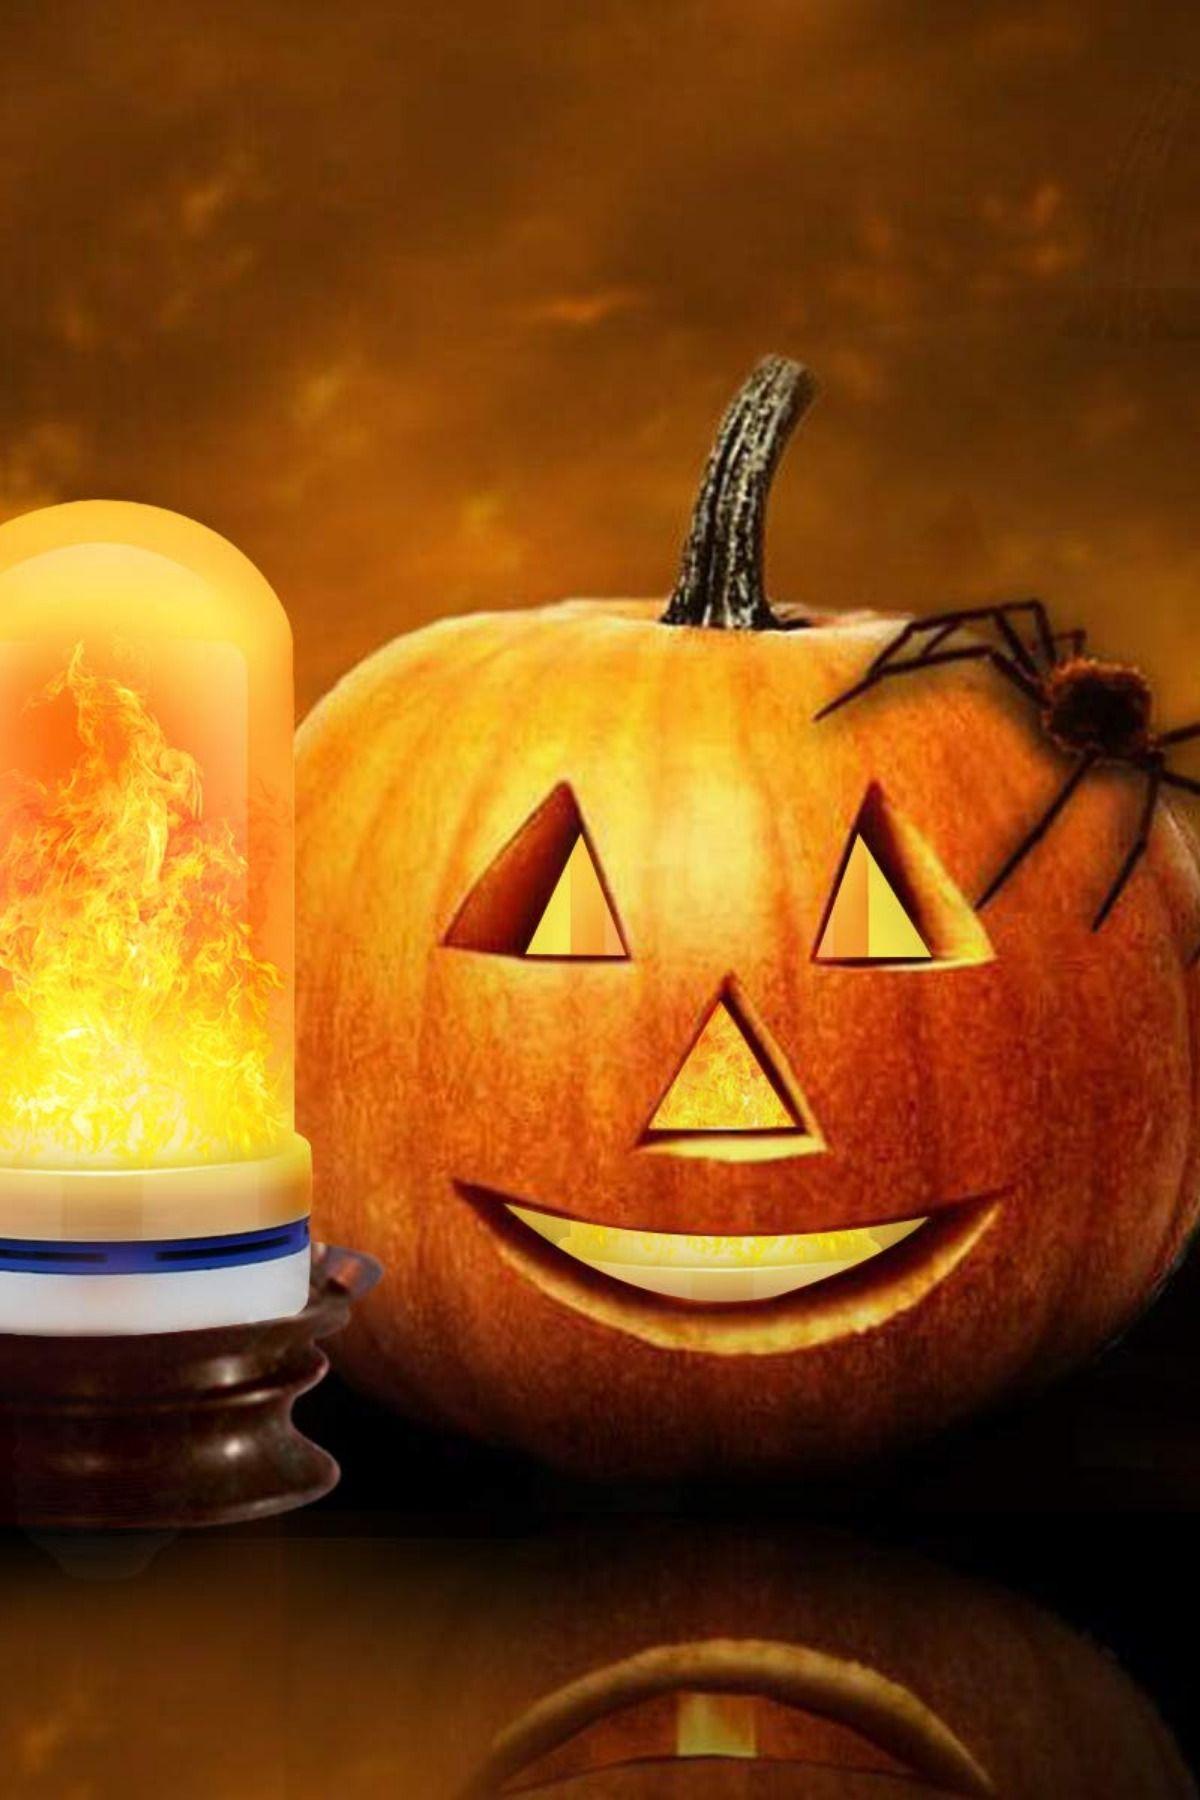 Flame Bulbs For Halloween Decoration Halloween Decorations Halloween Party Decor Hotel Bar